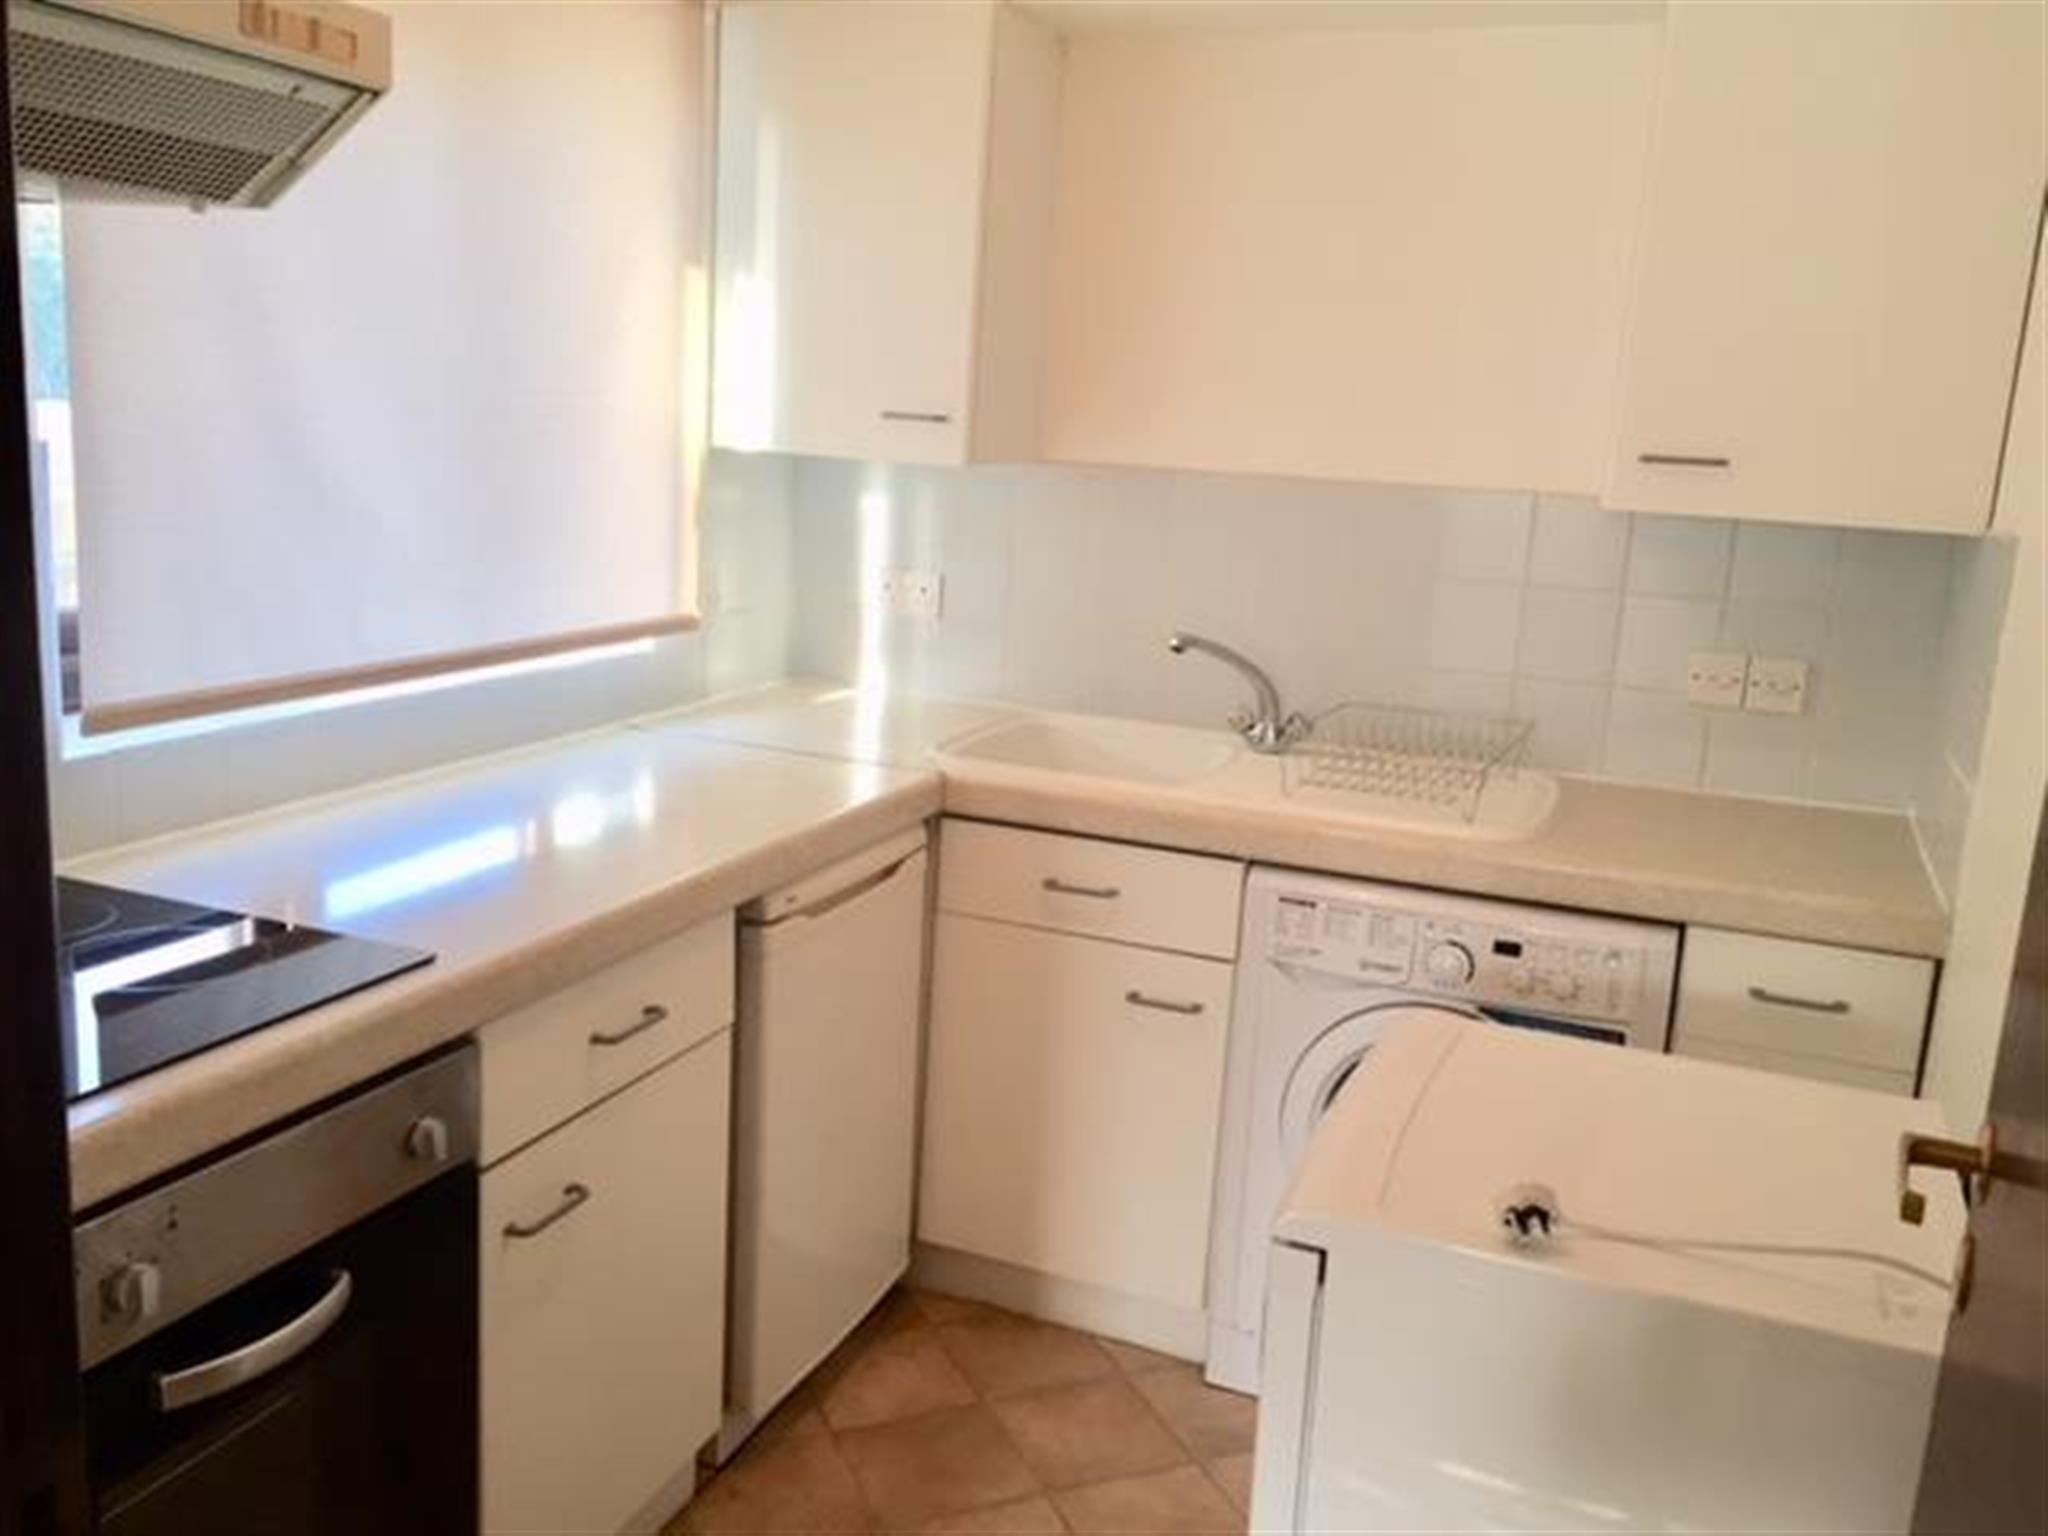 1 Bedroom Flat To Rent Drey Court The Avenue Worcester Park Kt4 7ew